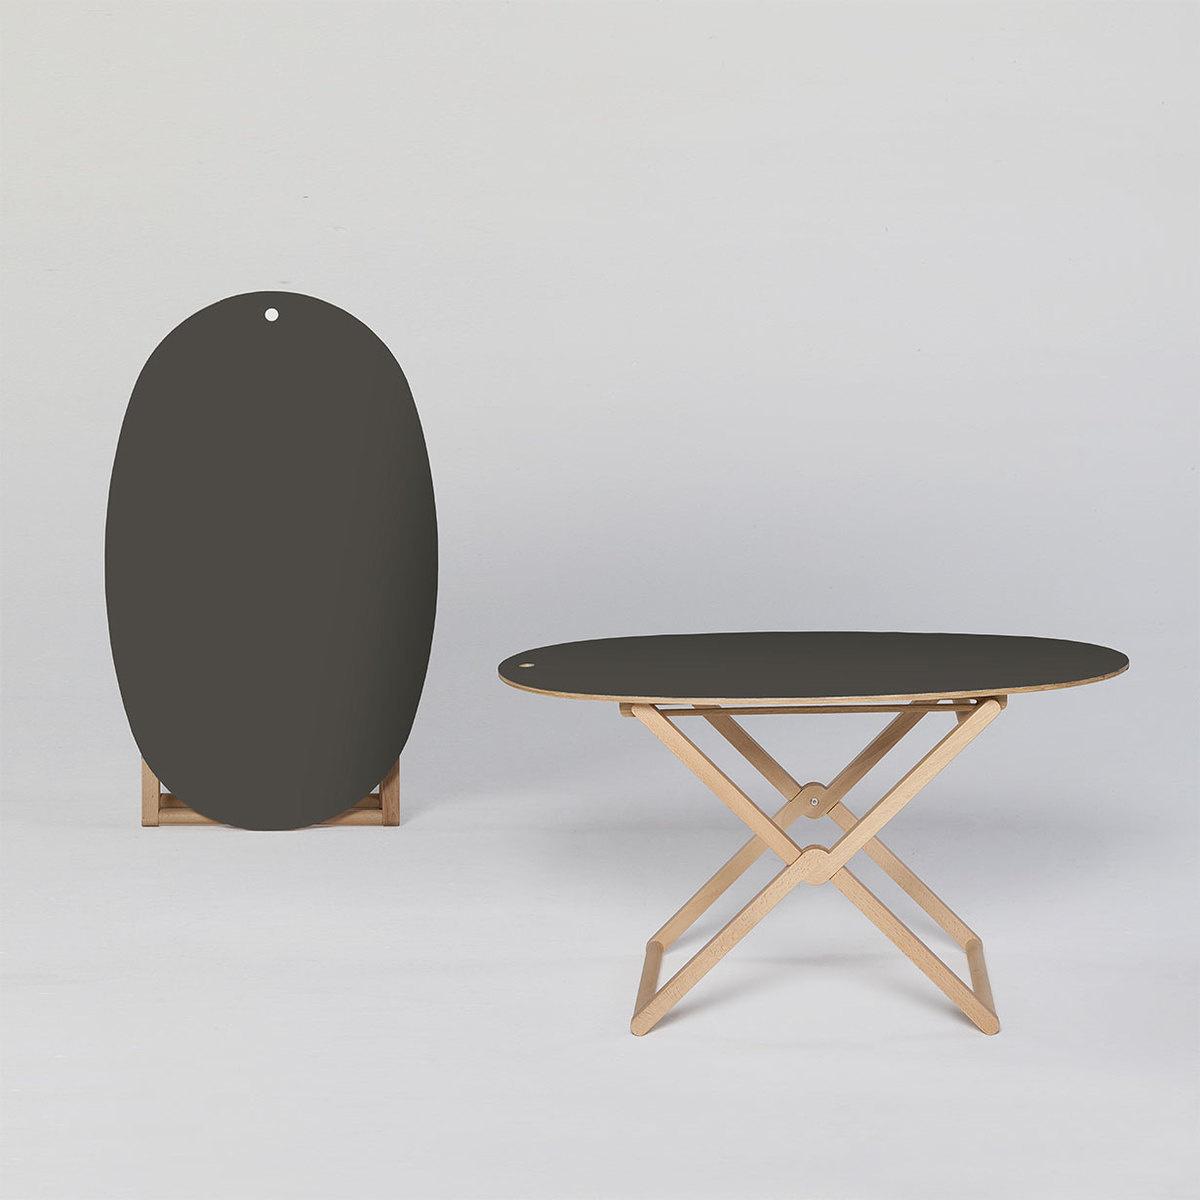 Beech Wood Coffee Table: Treee Oval Folding Coffee Table